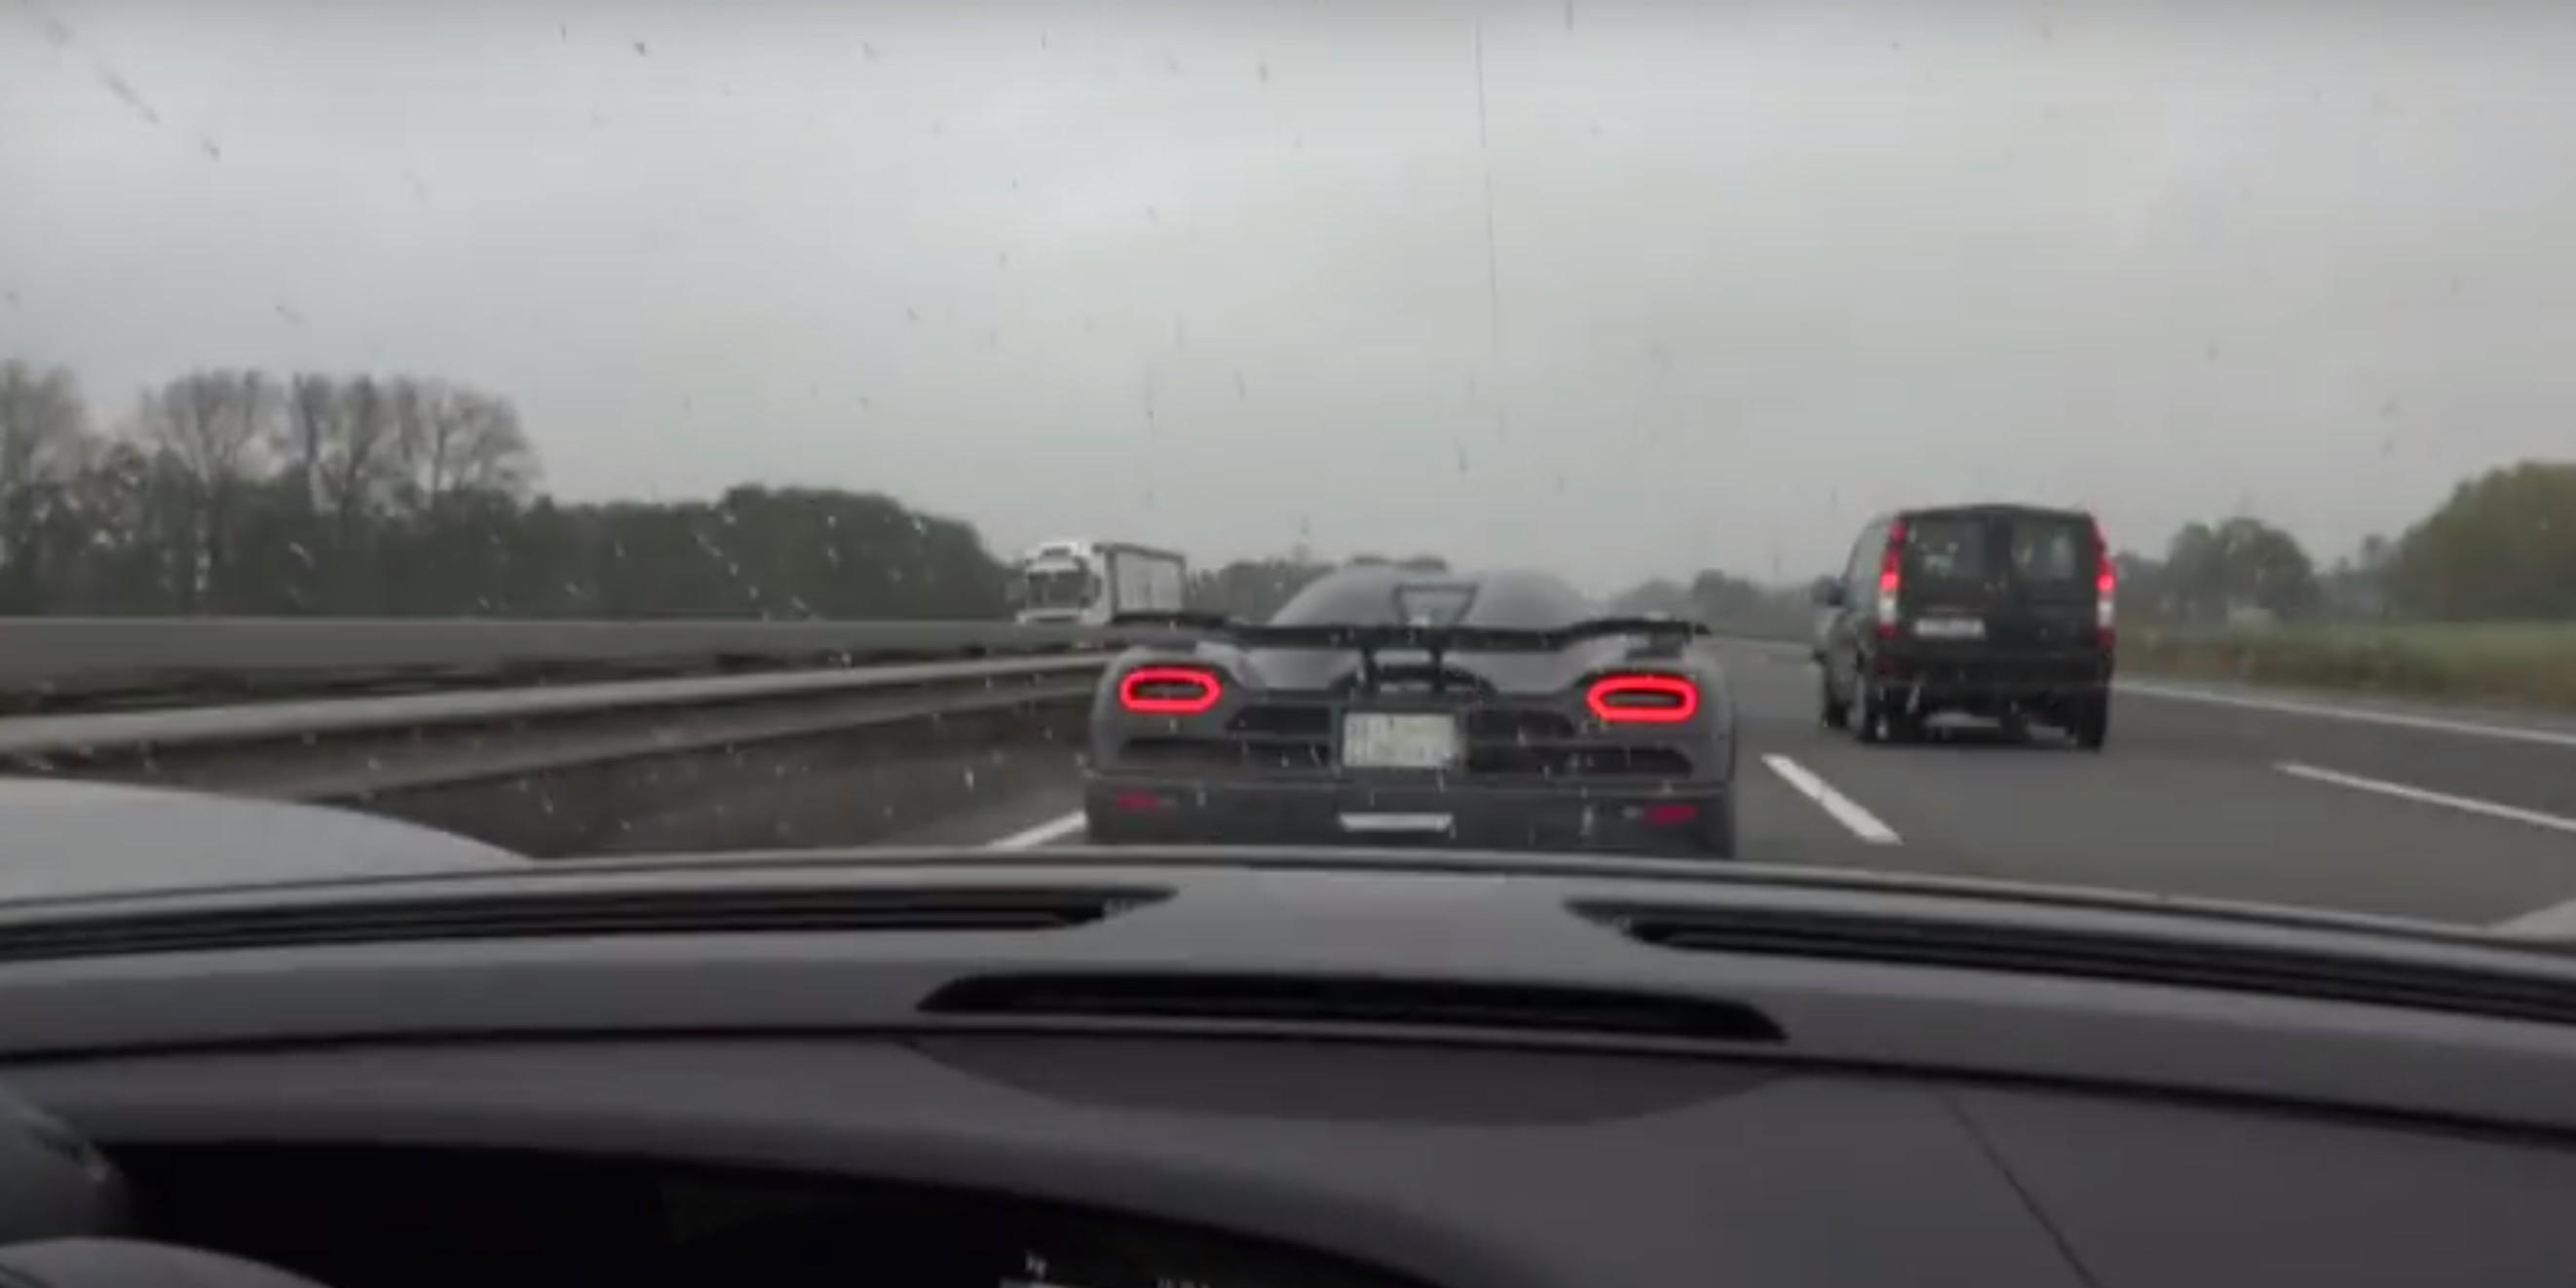 Porsche 918 Spyder Chases Koenigsegg Agera R On Autobahn ...